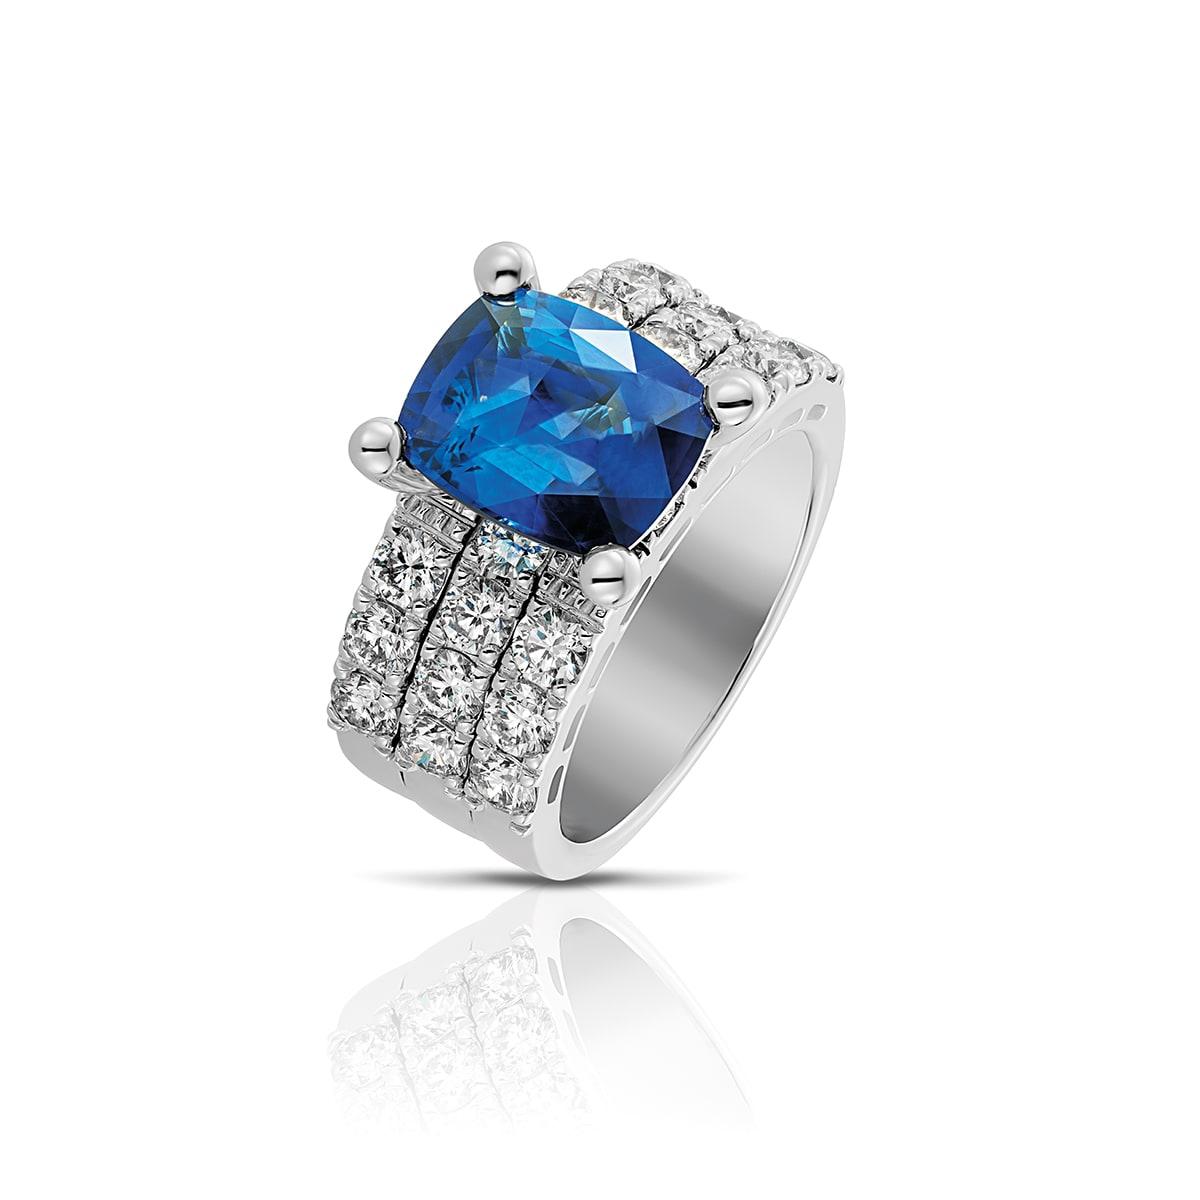 Ring blauwe saffier